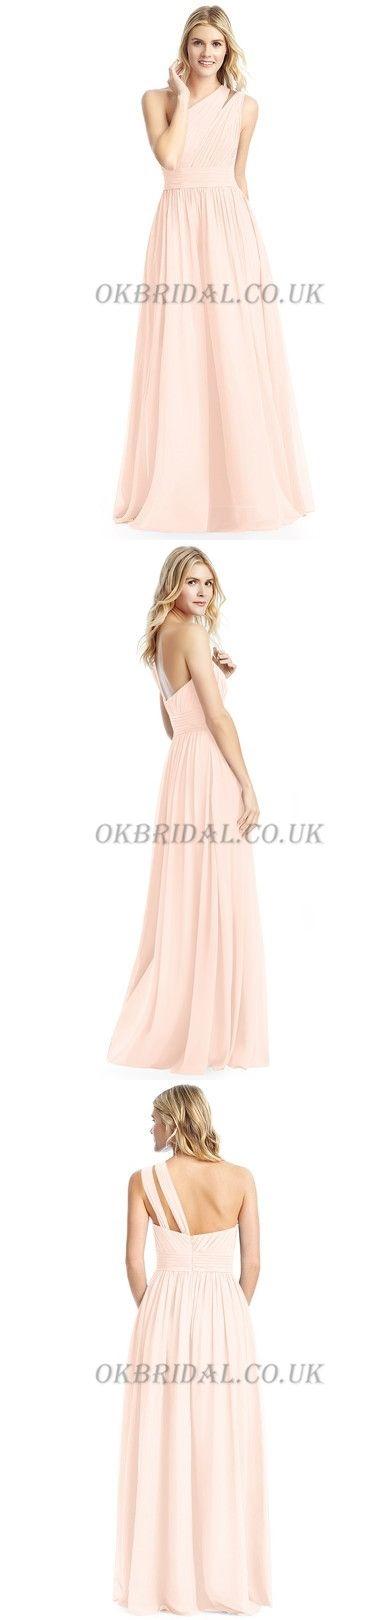 Tulle Bridesmaid Dress, One Shoulder Bridesmaid Dress, Backless Bridesmaid Dress #okbridal